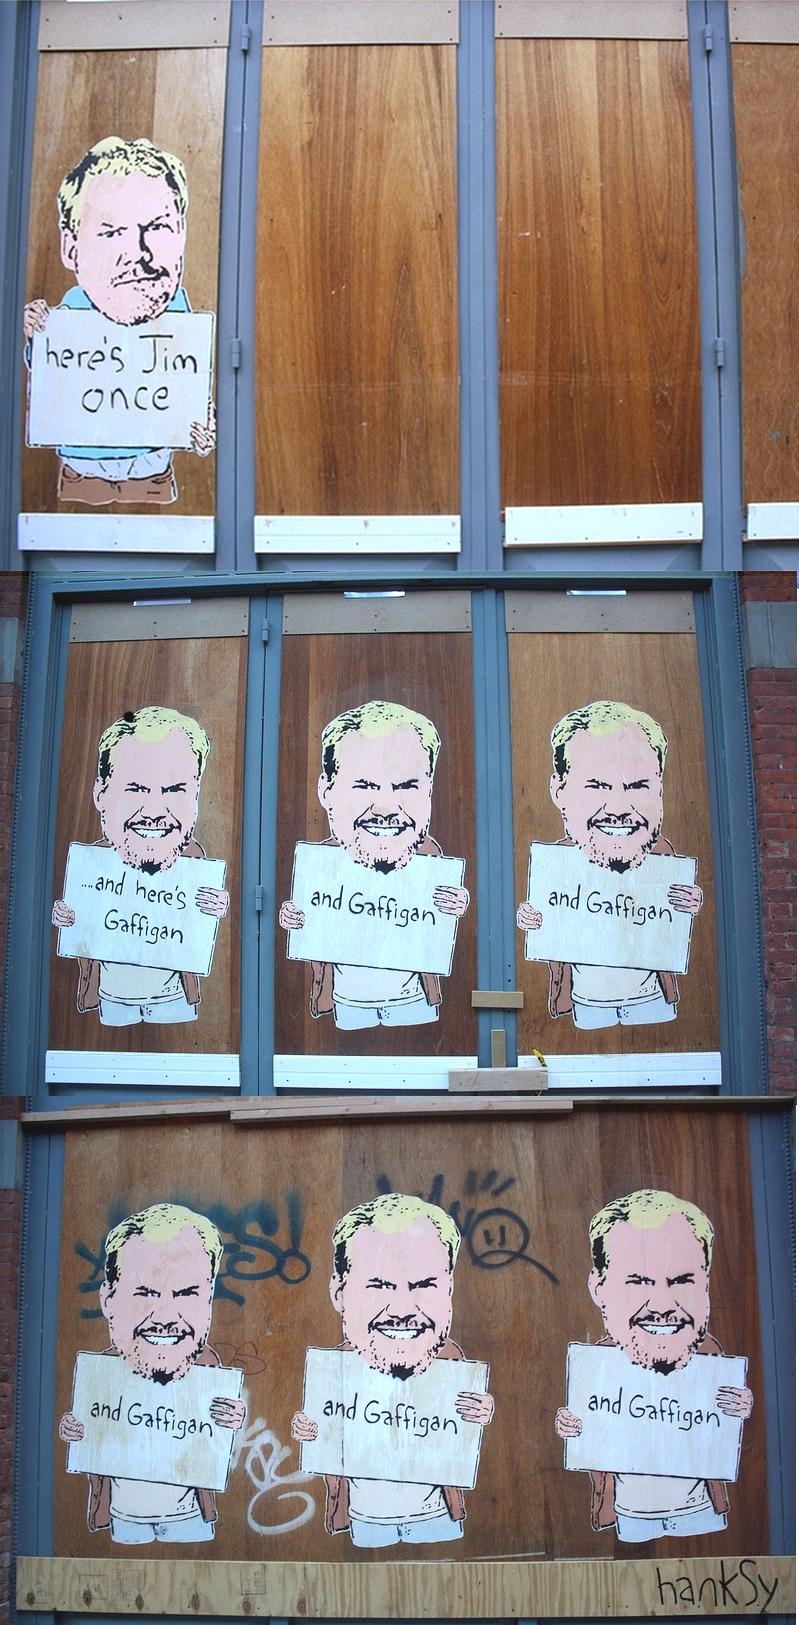 Graffigan, NYC Comedy Festival